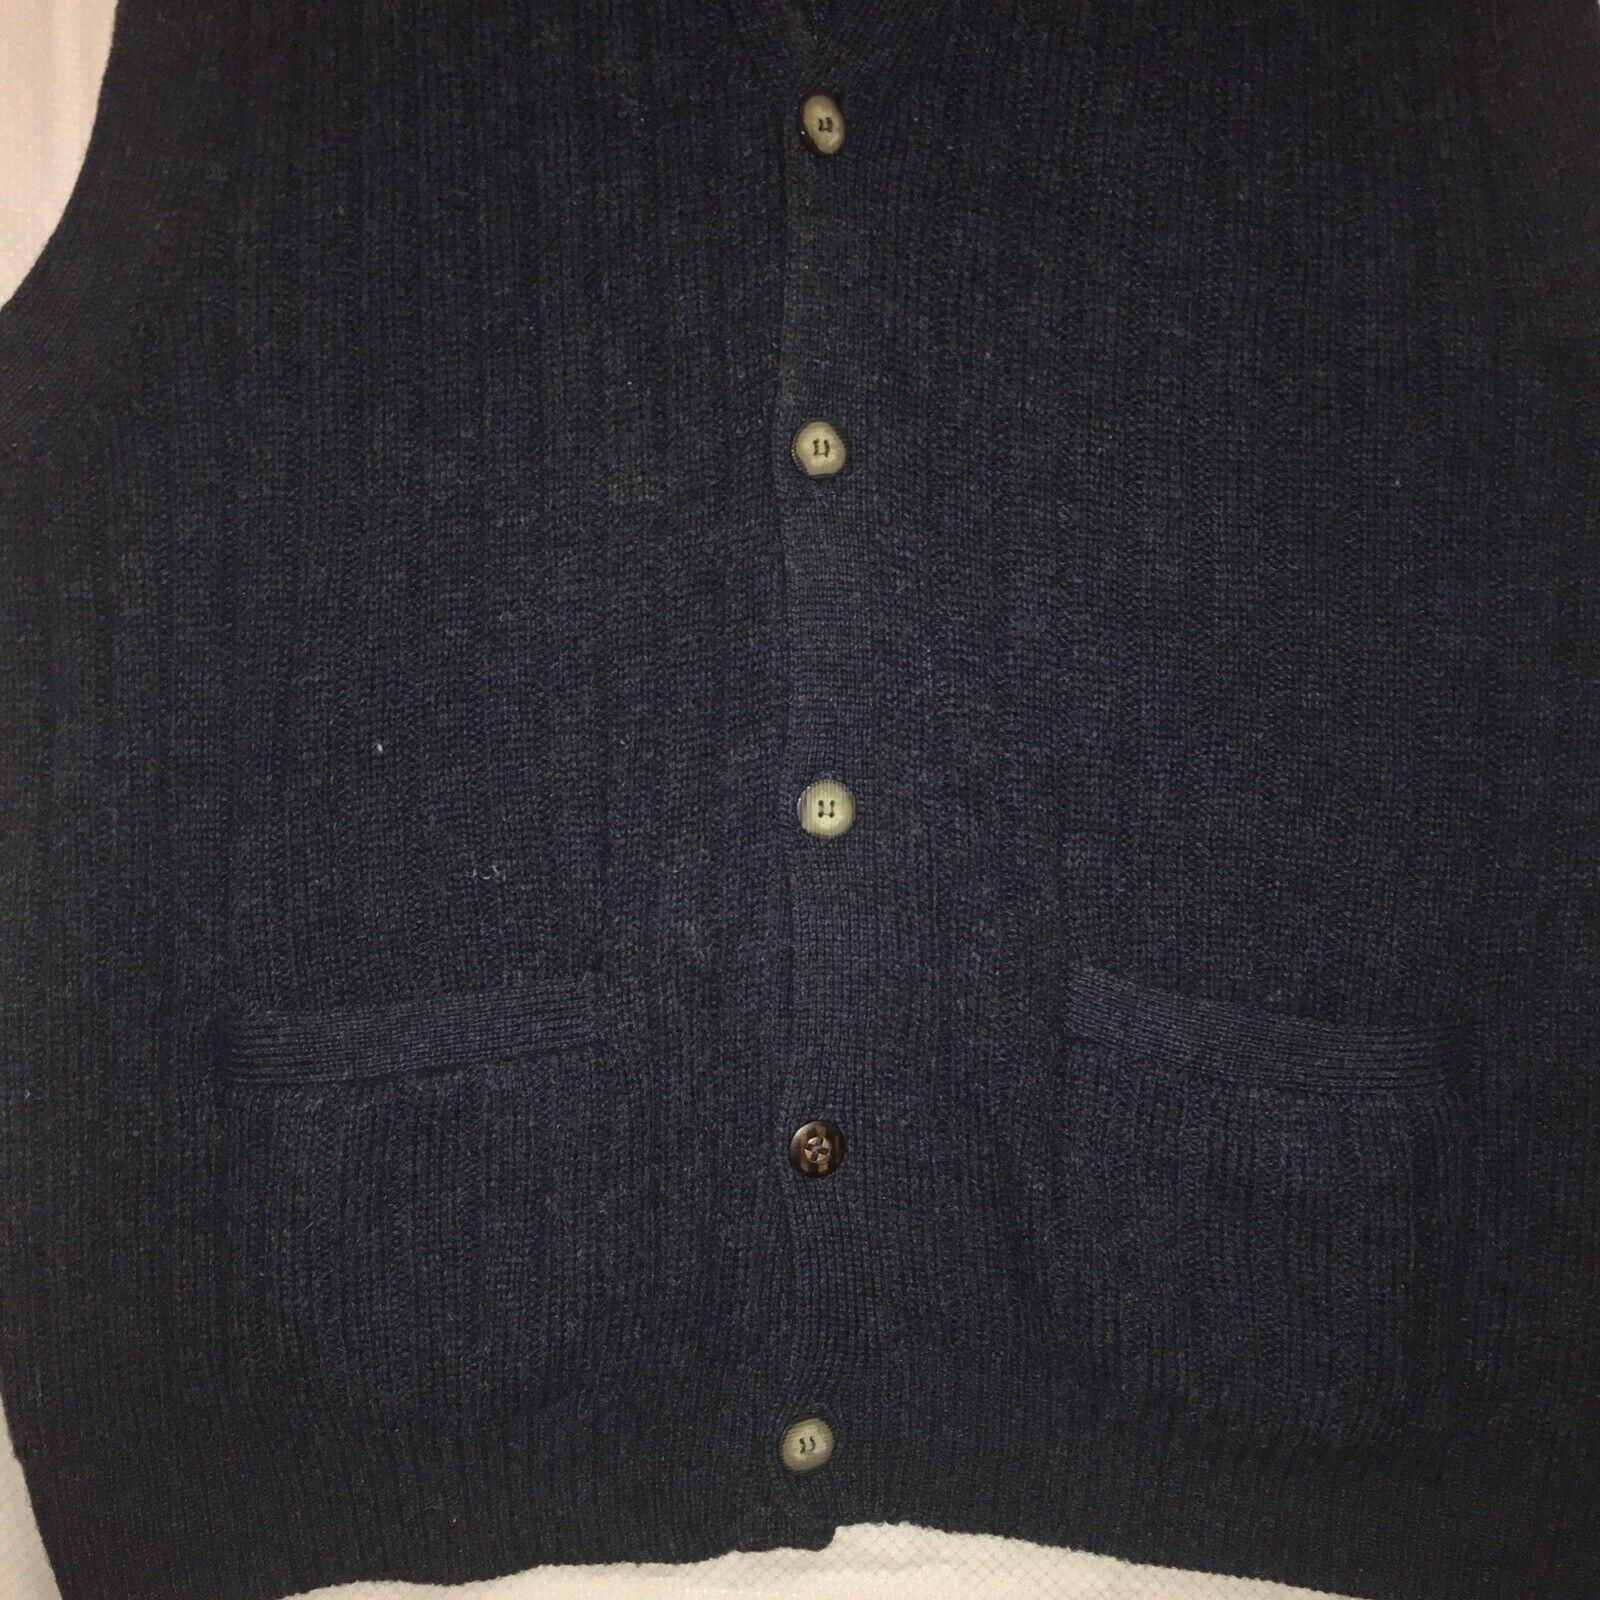 Vintage Woolrich Sweater Vest - image 4